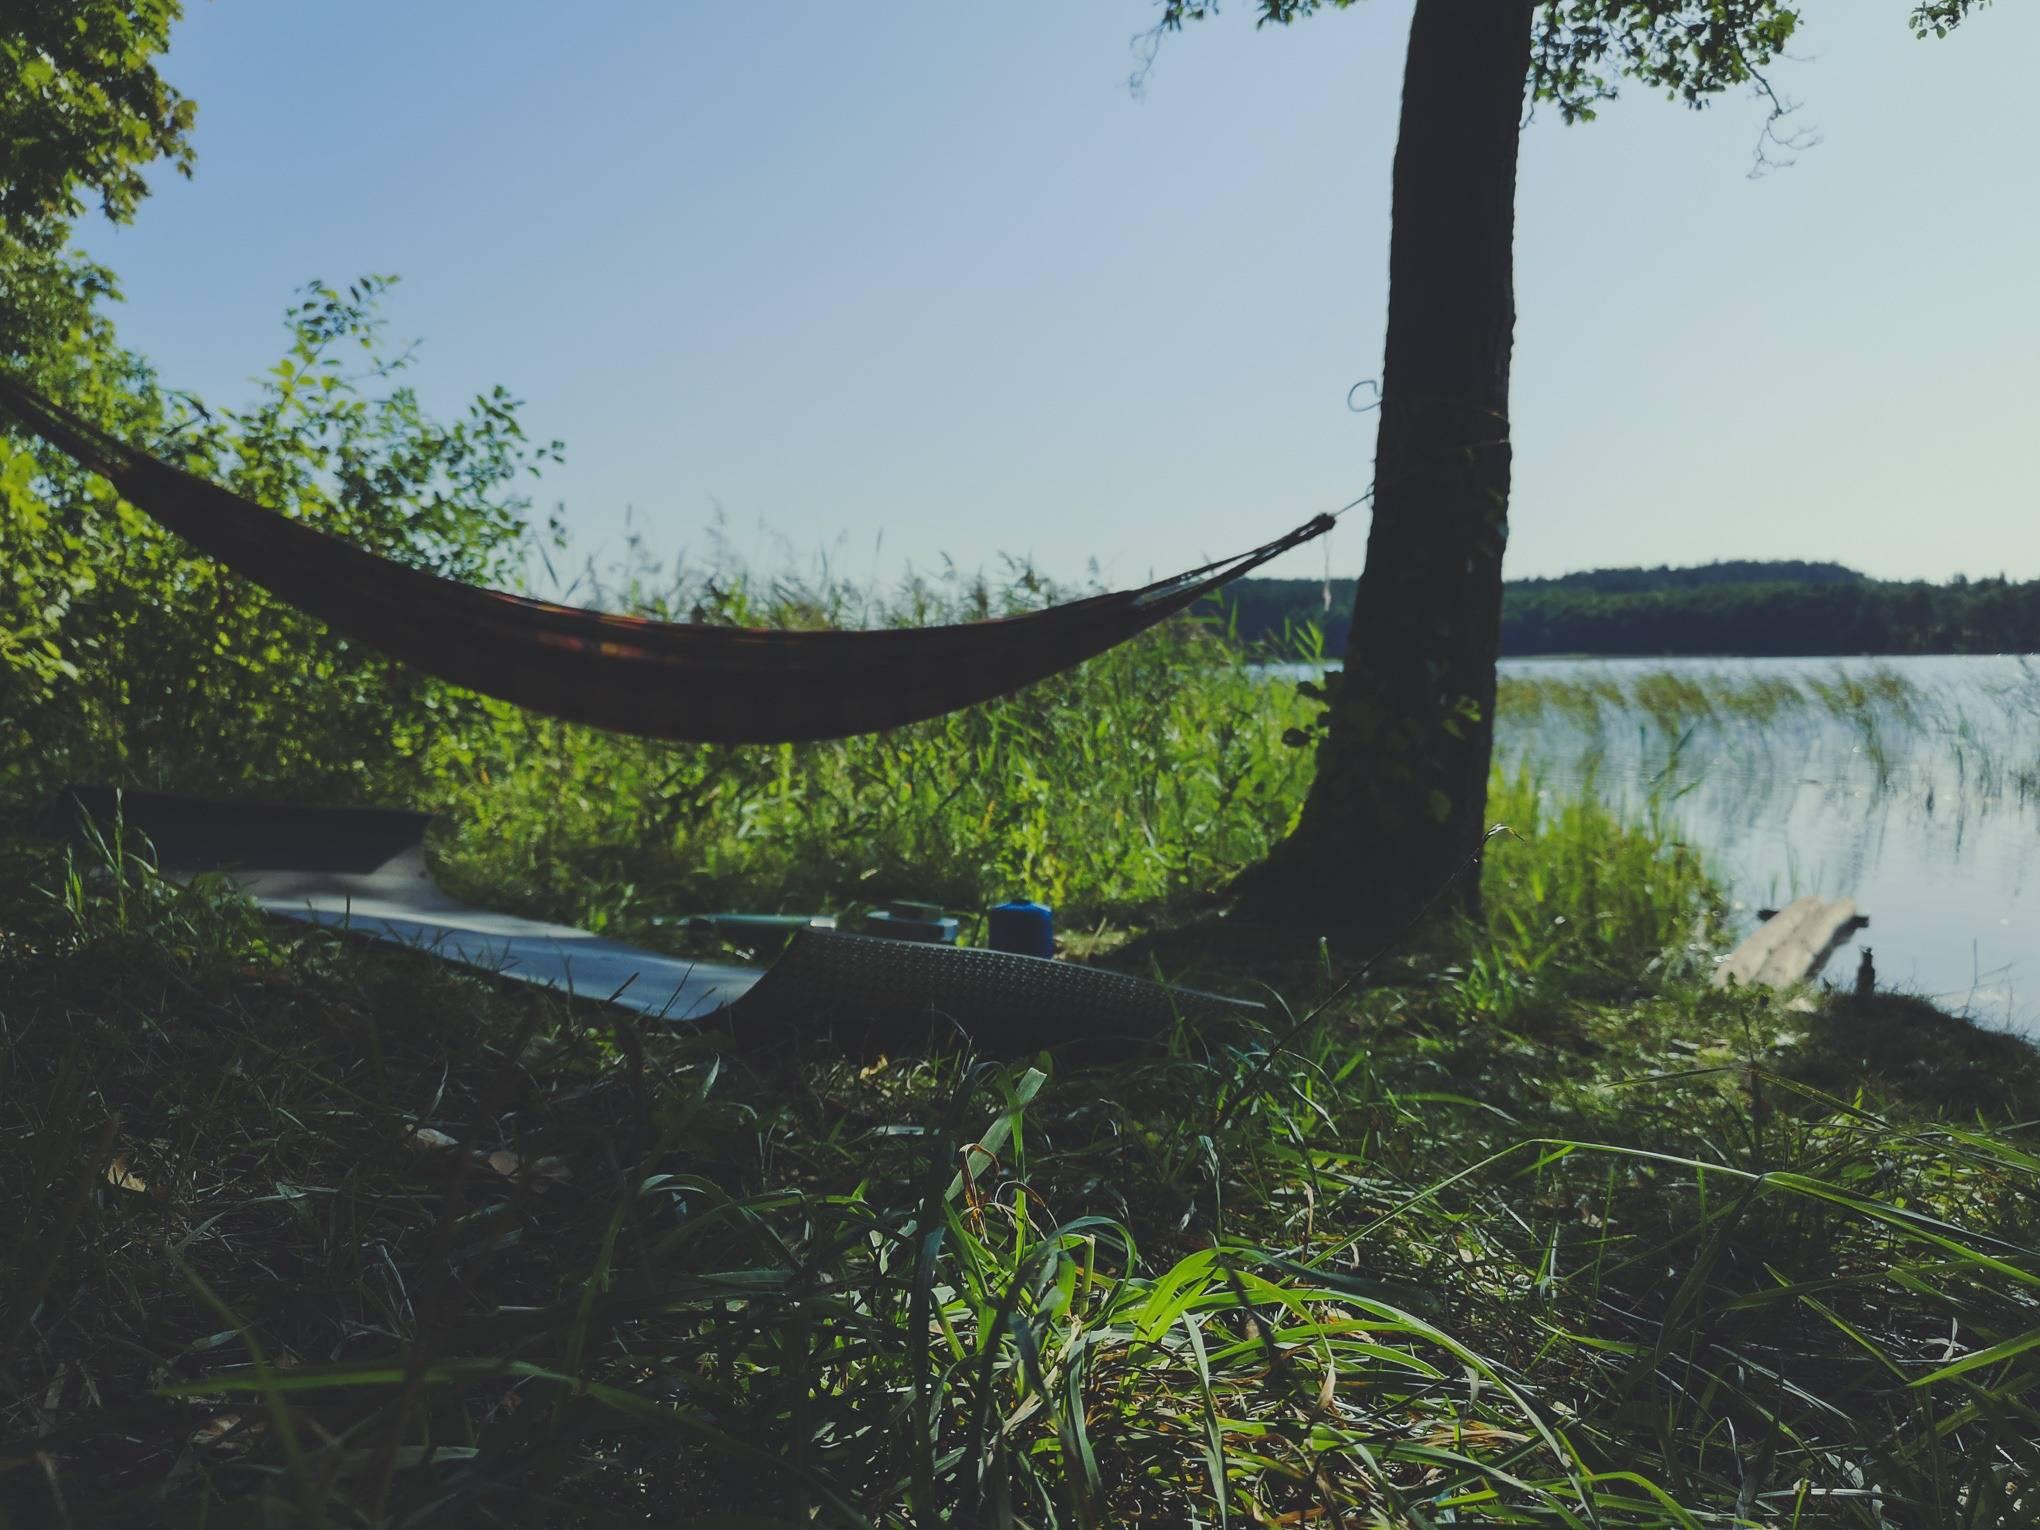 Hammock near White Lakajai Lake in Labanoras Regional Park, Lithuania. Photo Alis Monte [CC BY-SA 4.0], via Connecting the Dots